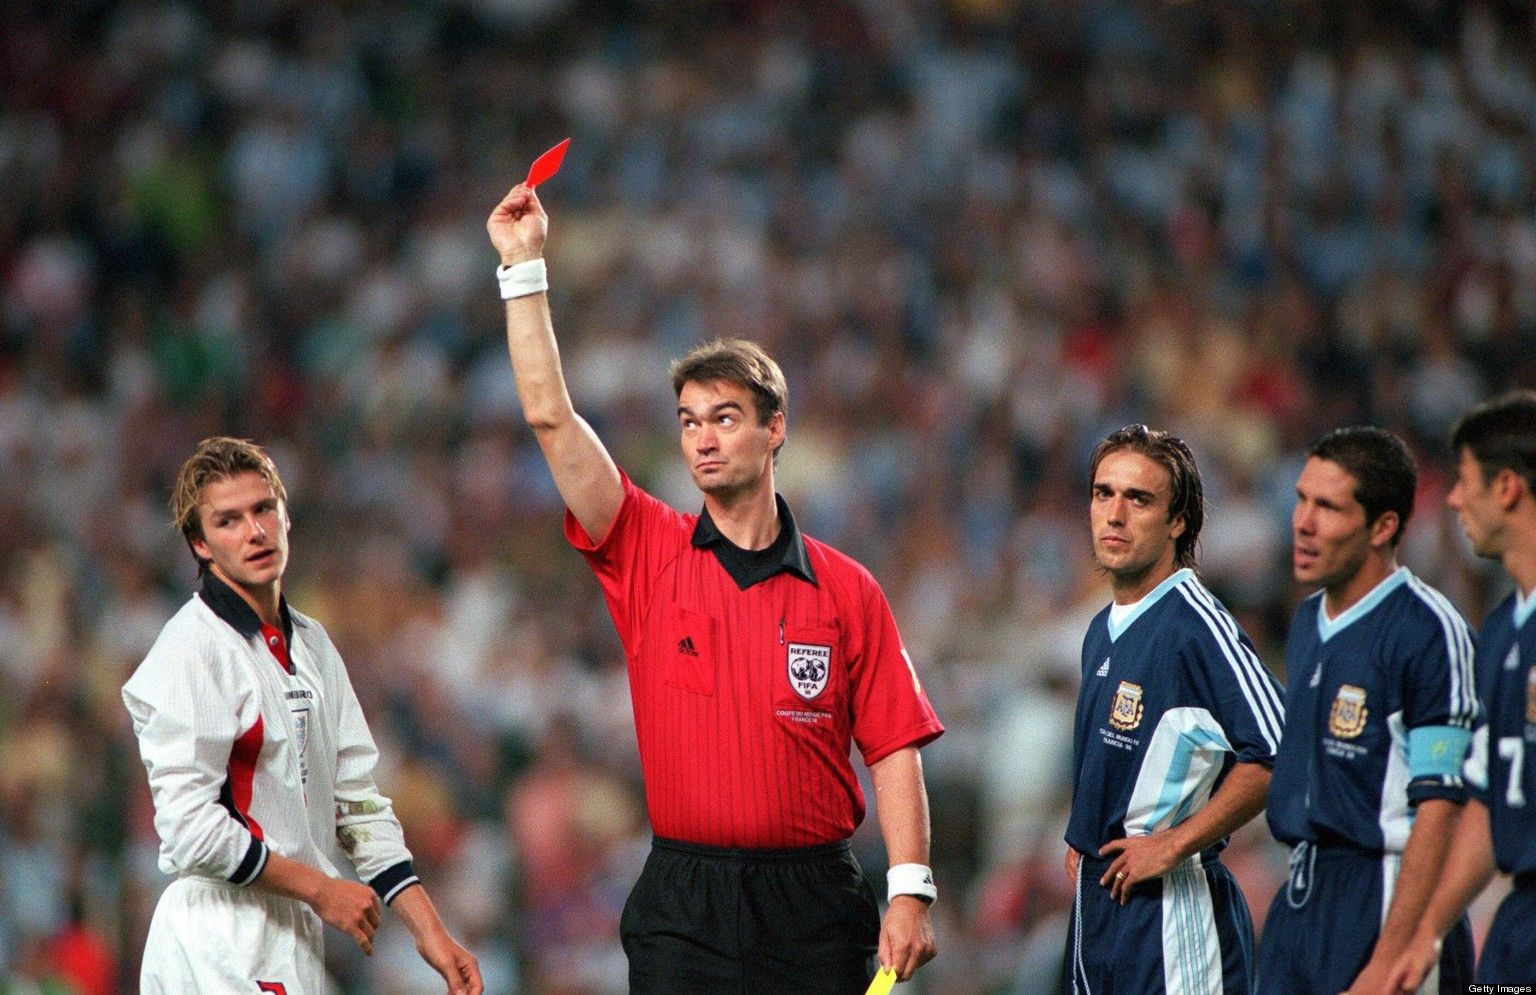 David Beckham's Red Card vs Argentina 1998 David beckham